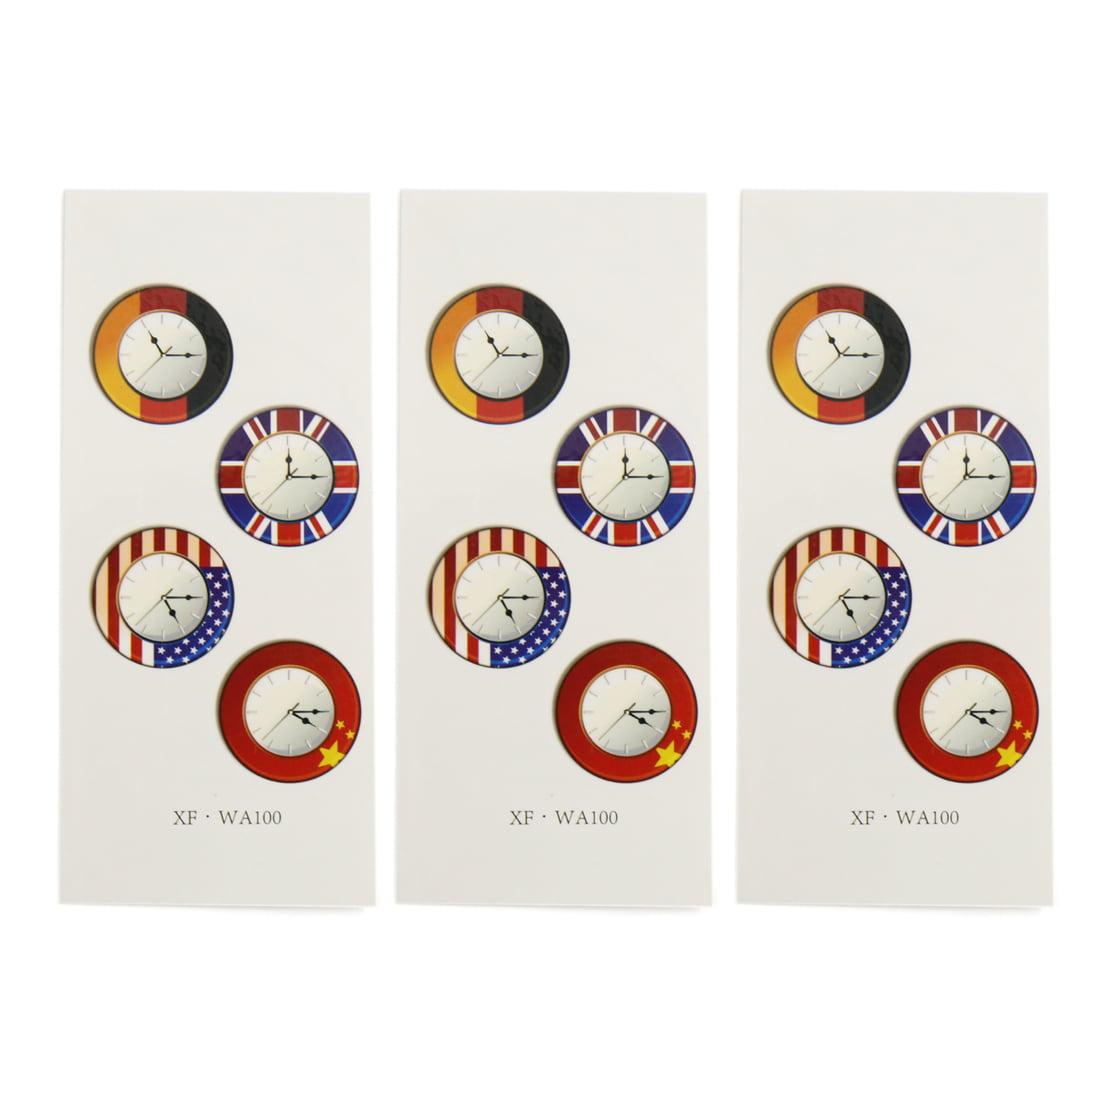 3 Pcs International Clocks Prints Temporary Tattoo Sticker Body Decal - image 1 of 1